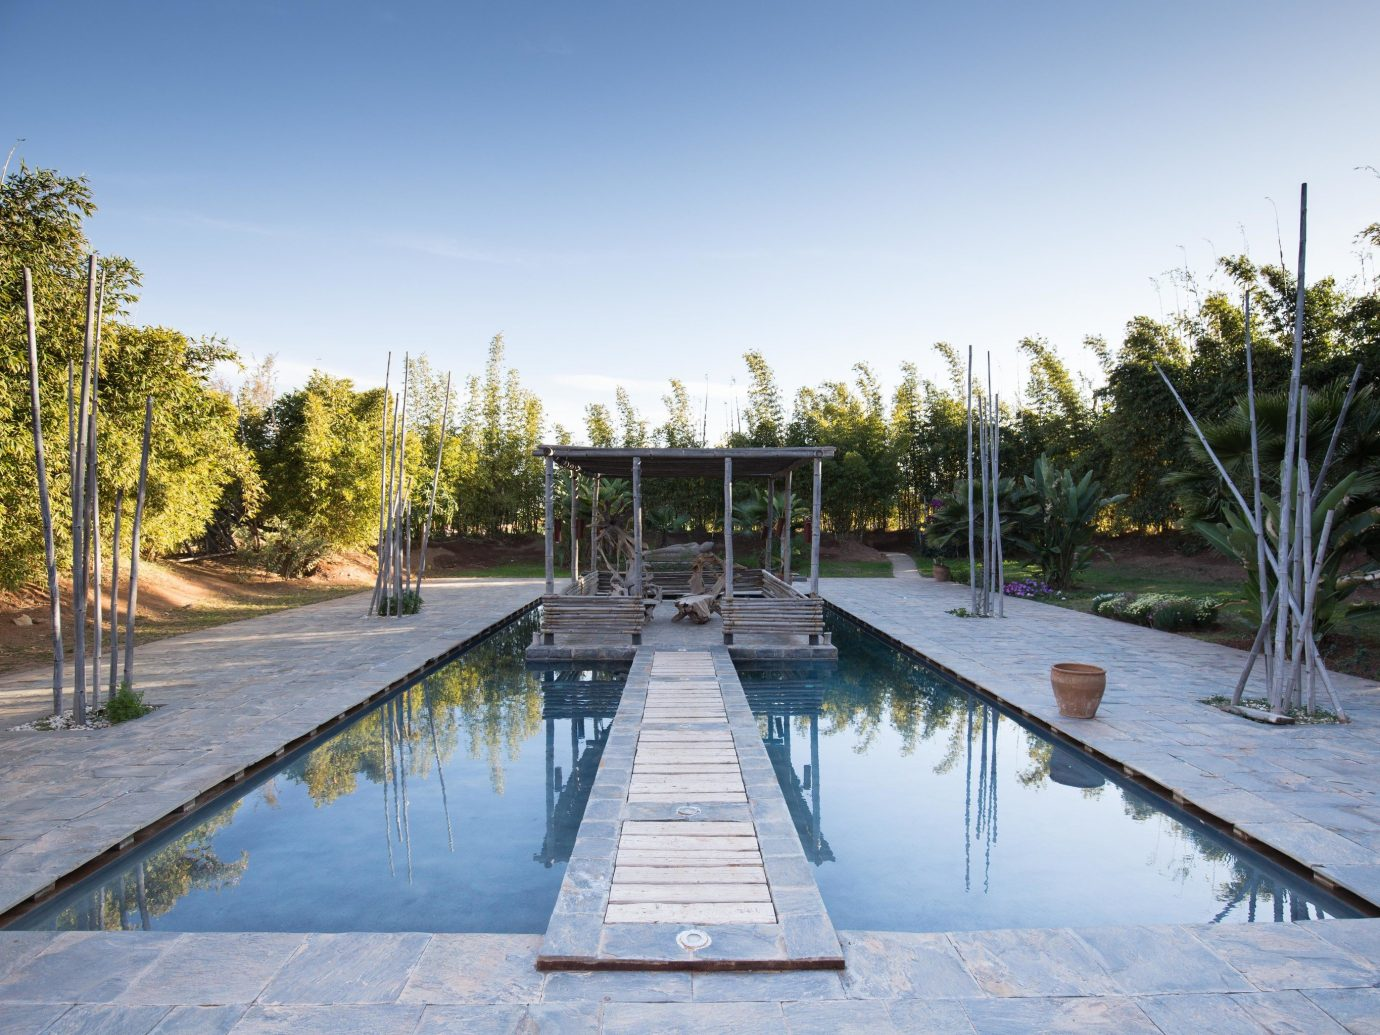 Hotels Solo Travel sky tree outdoor swimming pool leisure walkway estate reflecting pool dock Resort reflection backyard way lined